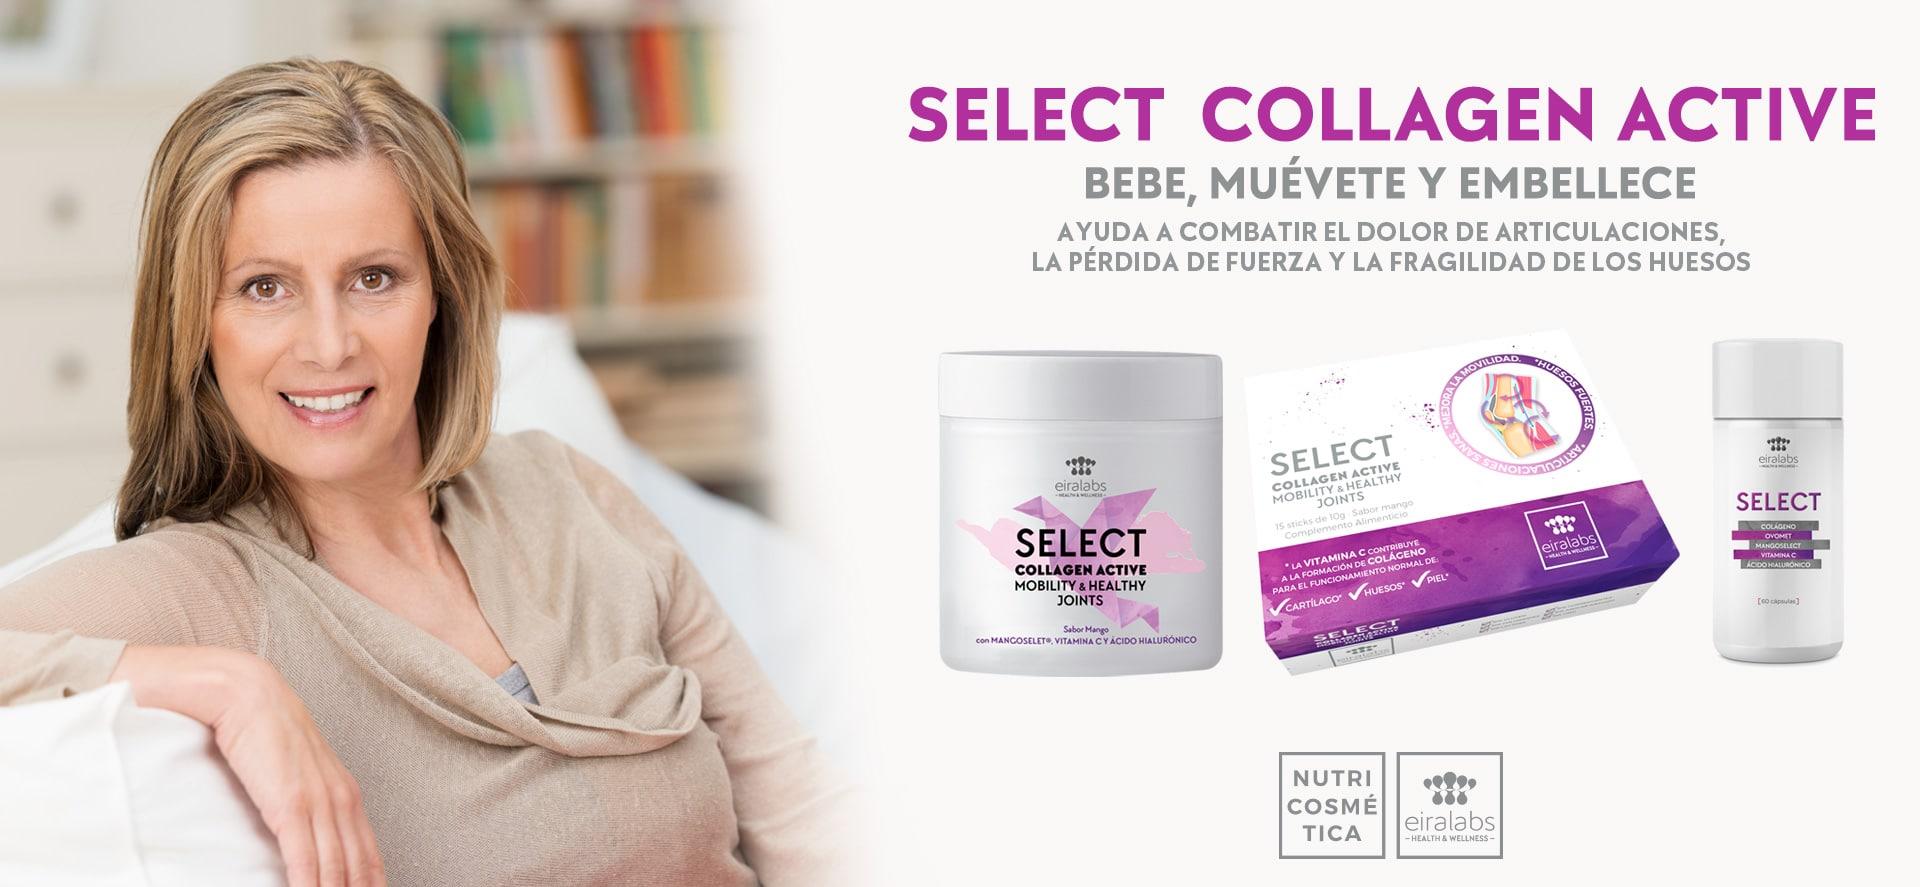 select-collagen-2020-eiralabs